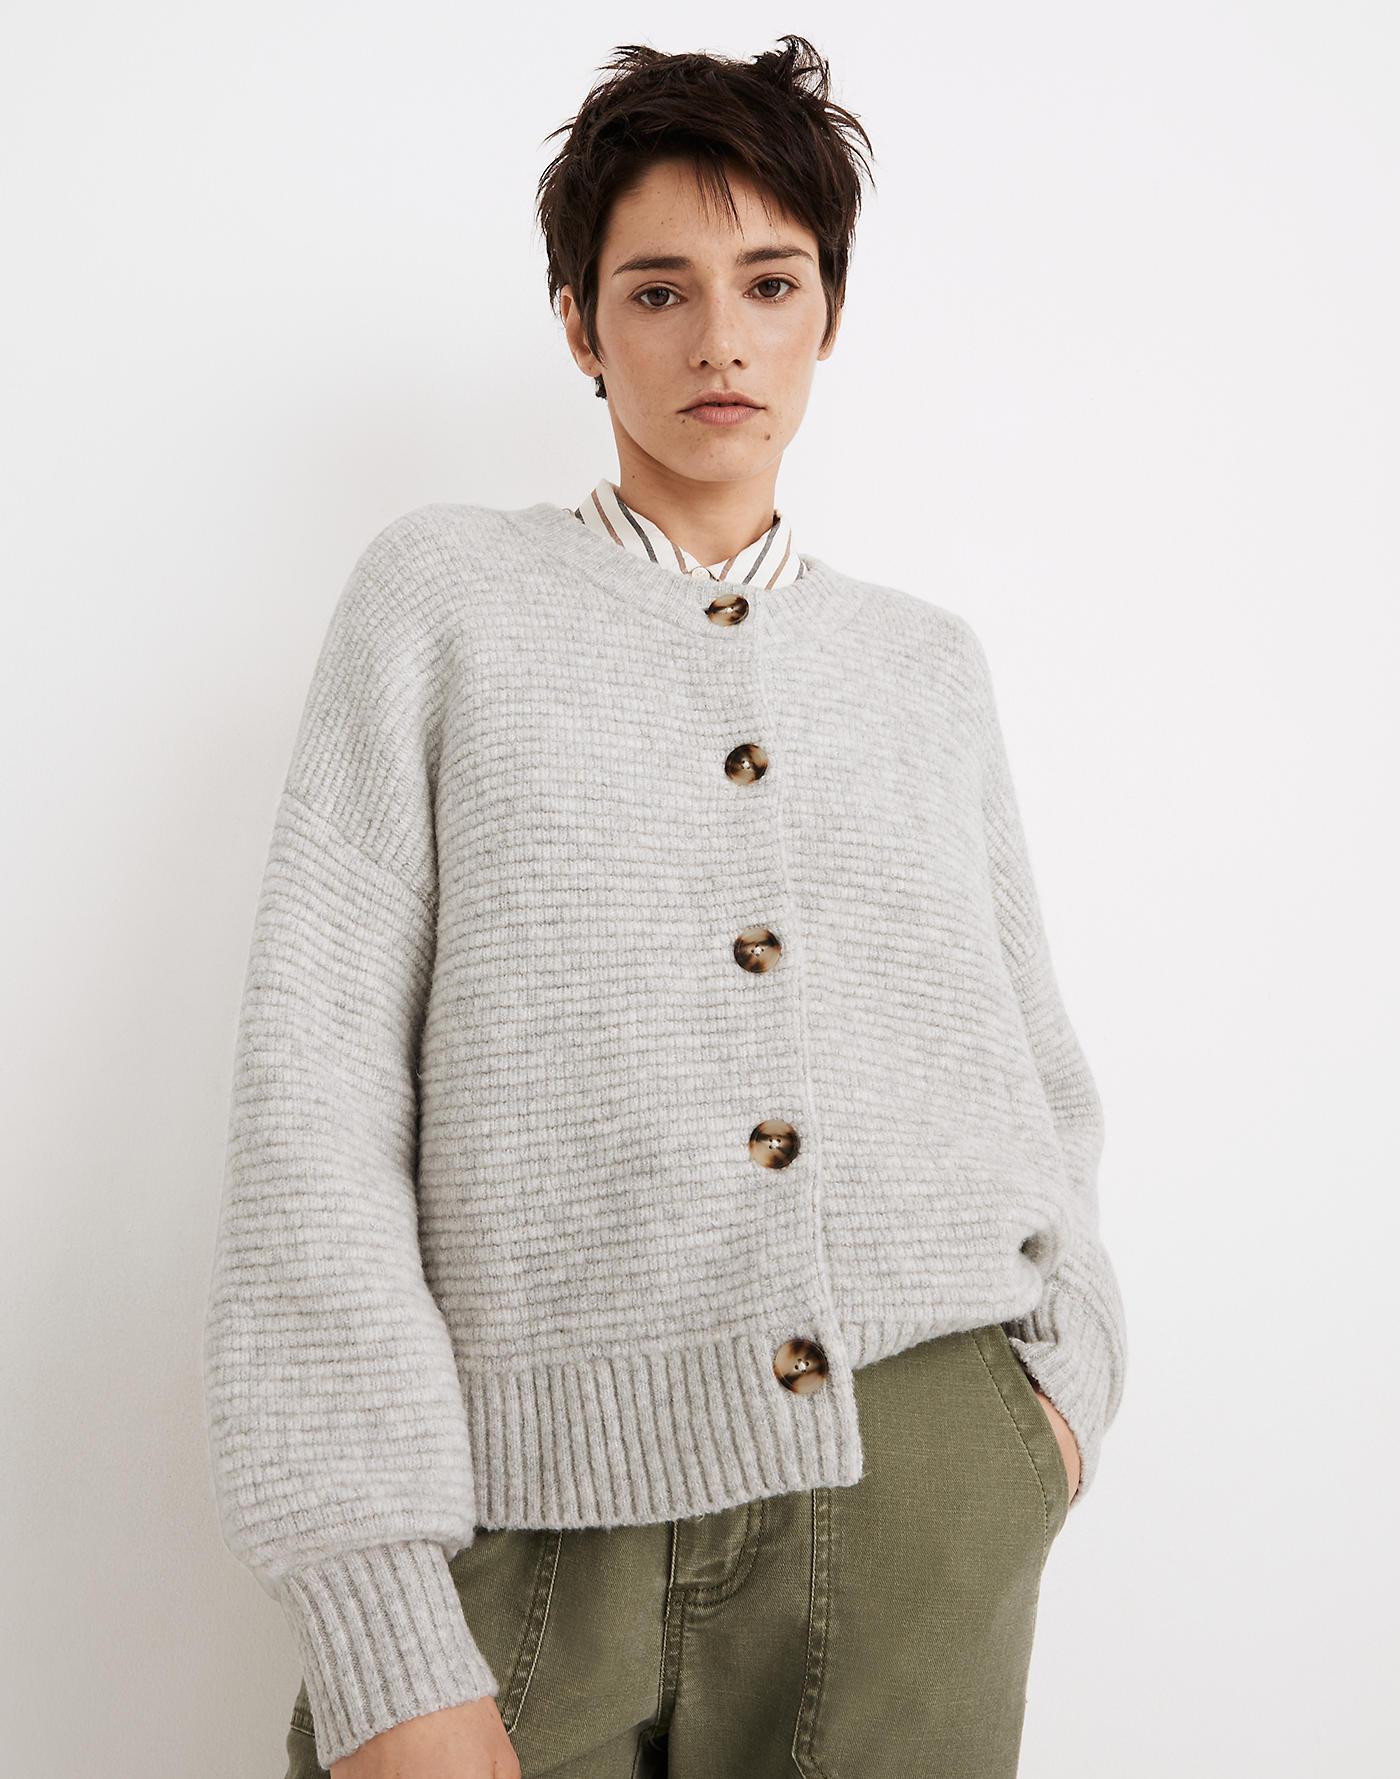 Madewell Springview Cardigan Sweater in Coziest Yarn